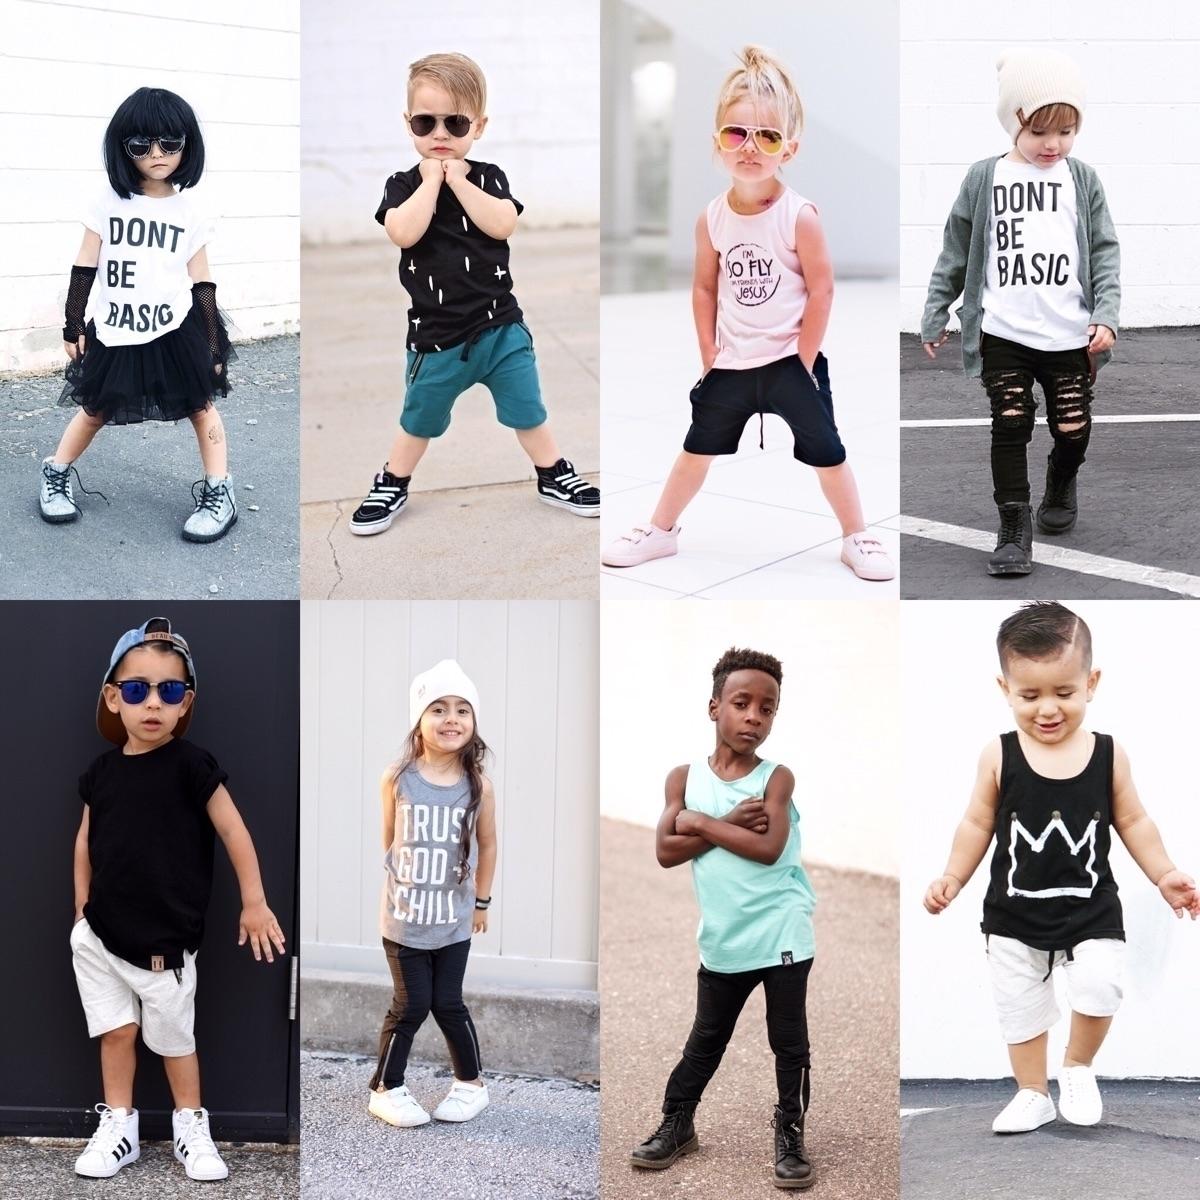 9 TWENTYFIVE KIDS (@9twentyfivekids) Cover Image